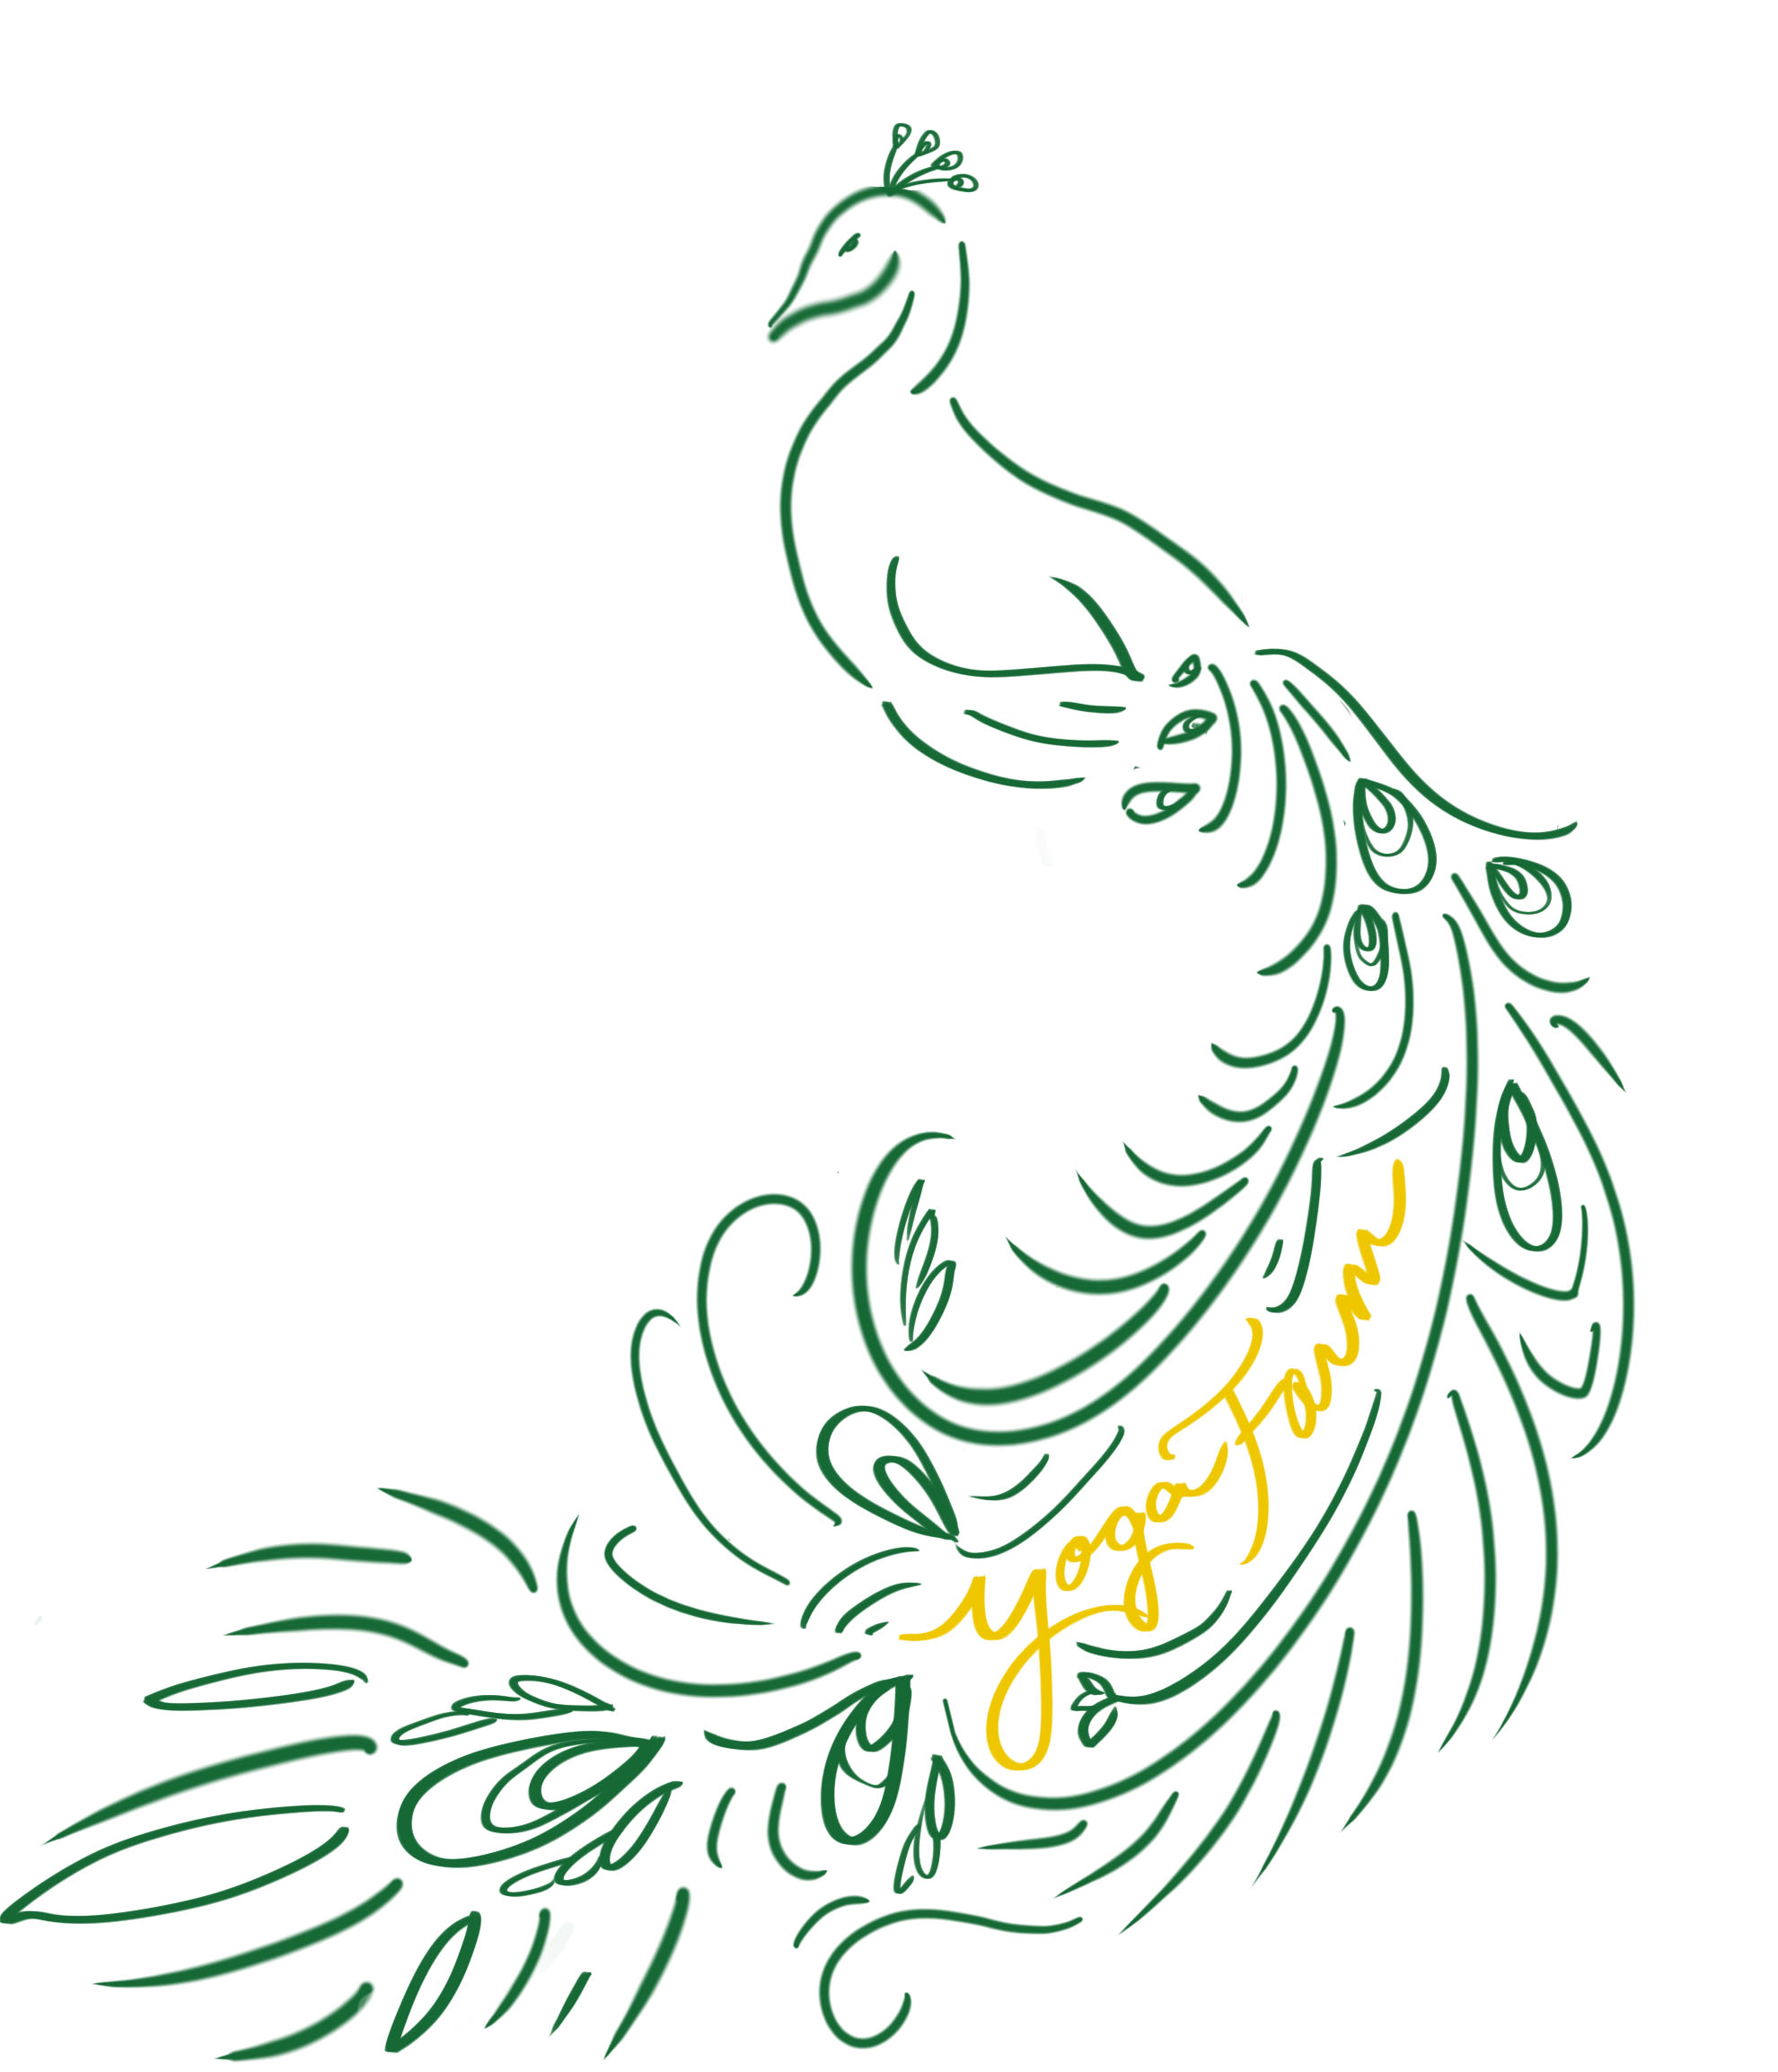 peacock graphic_3.jpg